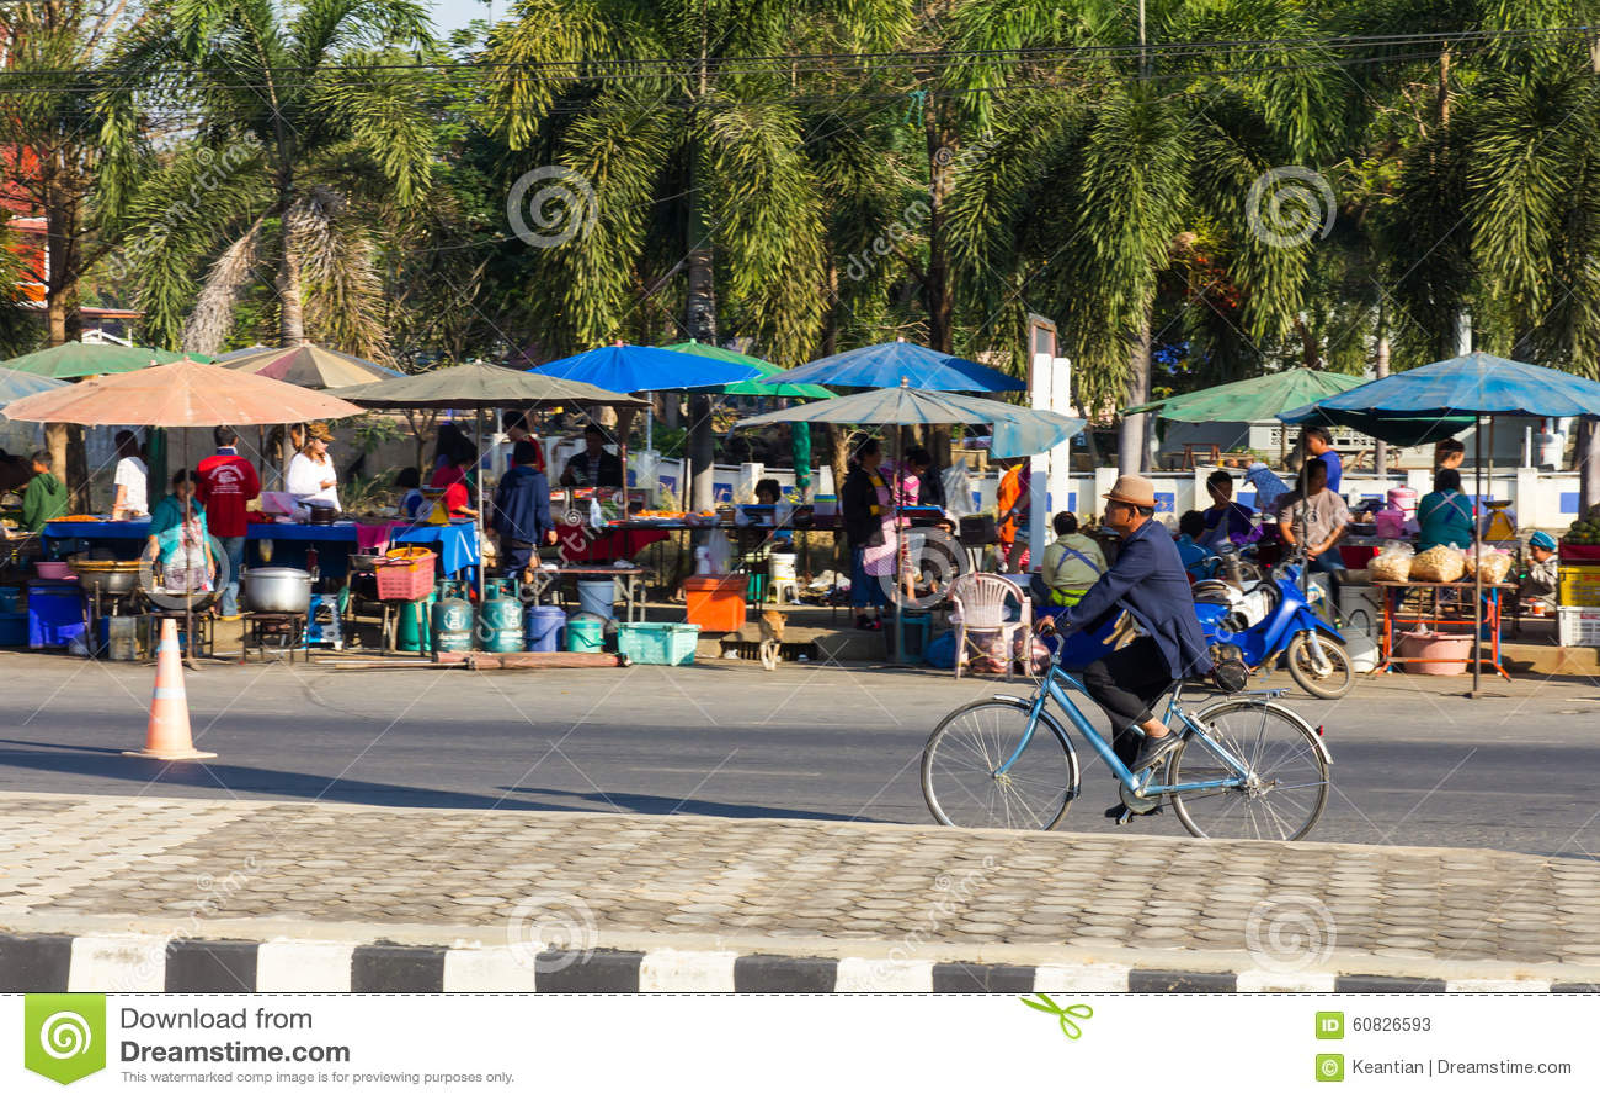 Mercado Biking del hombre